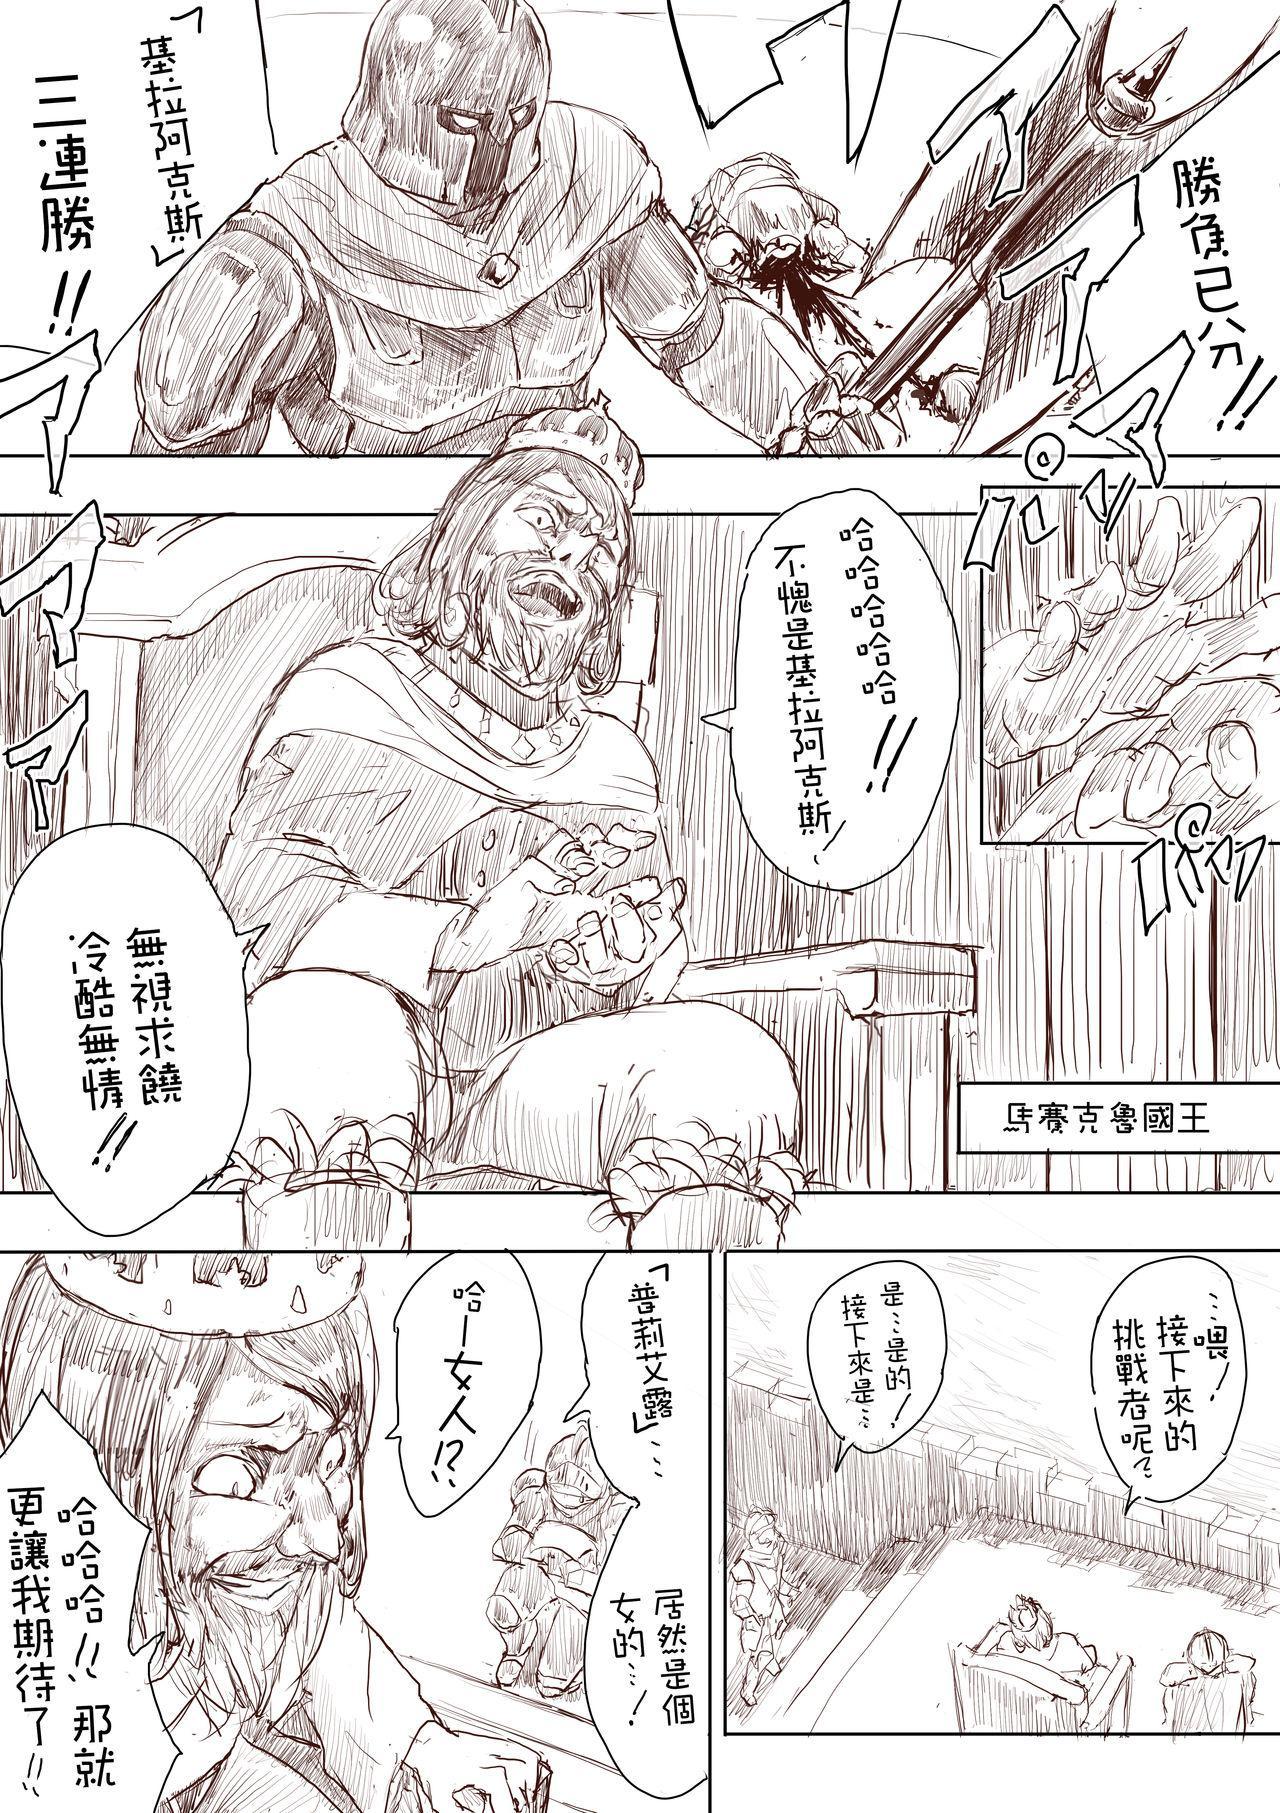 Elf Princess Strikes Back Part1 3